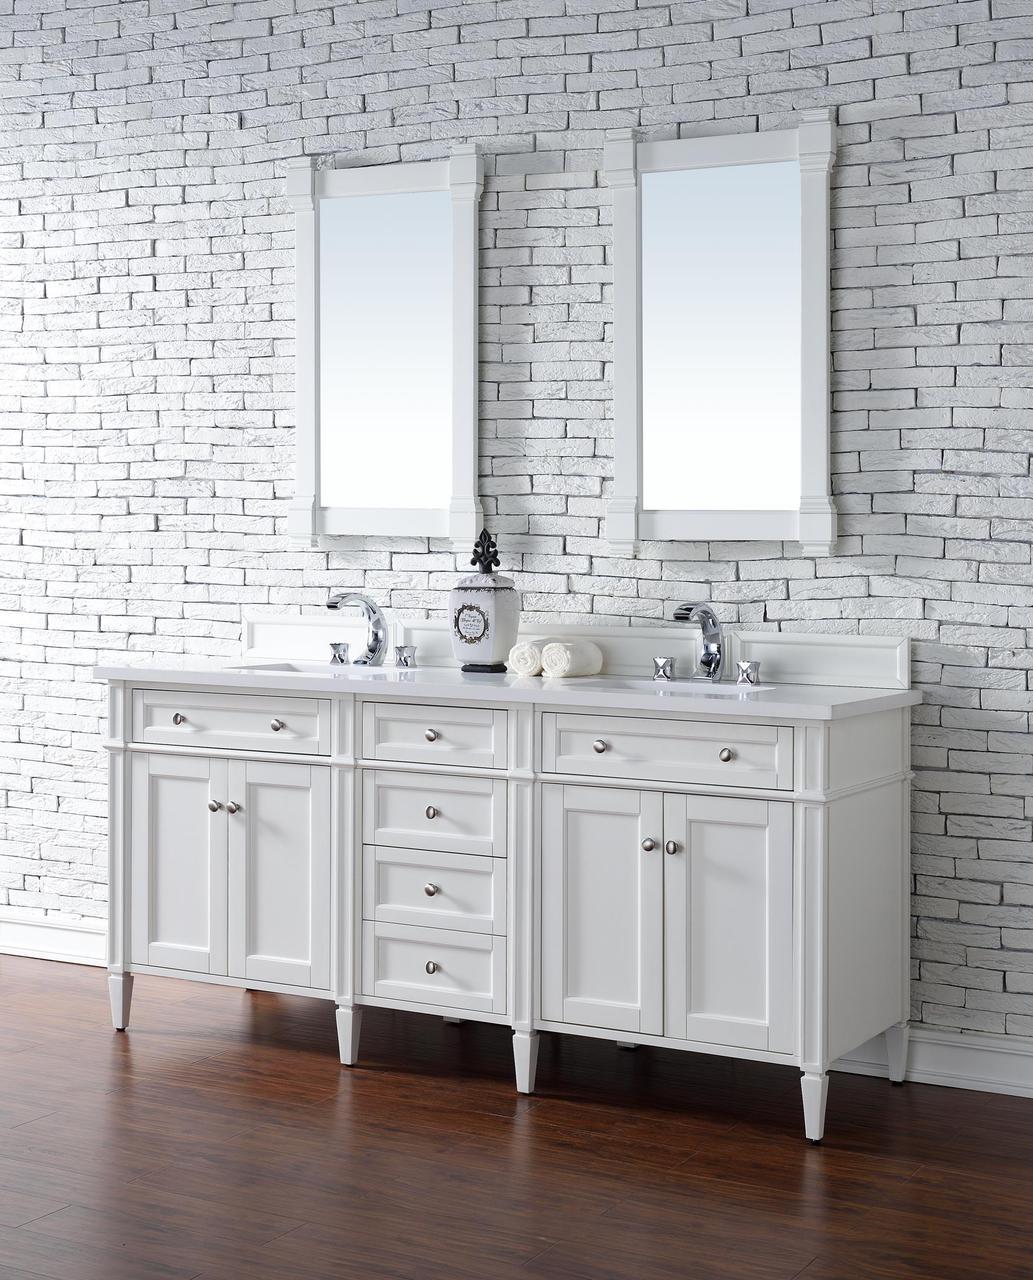 Bathroom vanities no sink - Bathroom Vanity No Sink Vanities Globorank